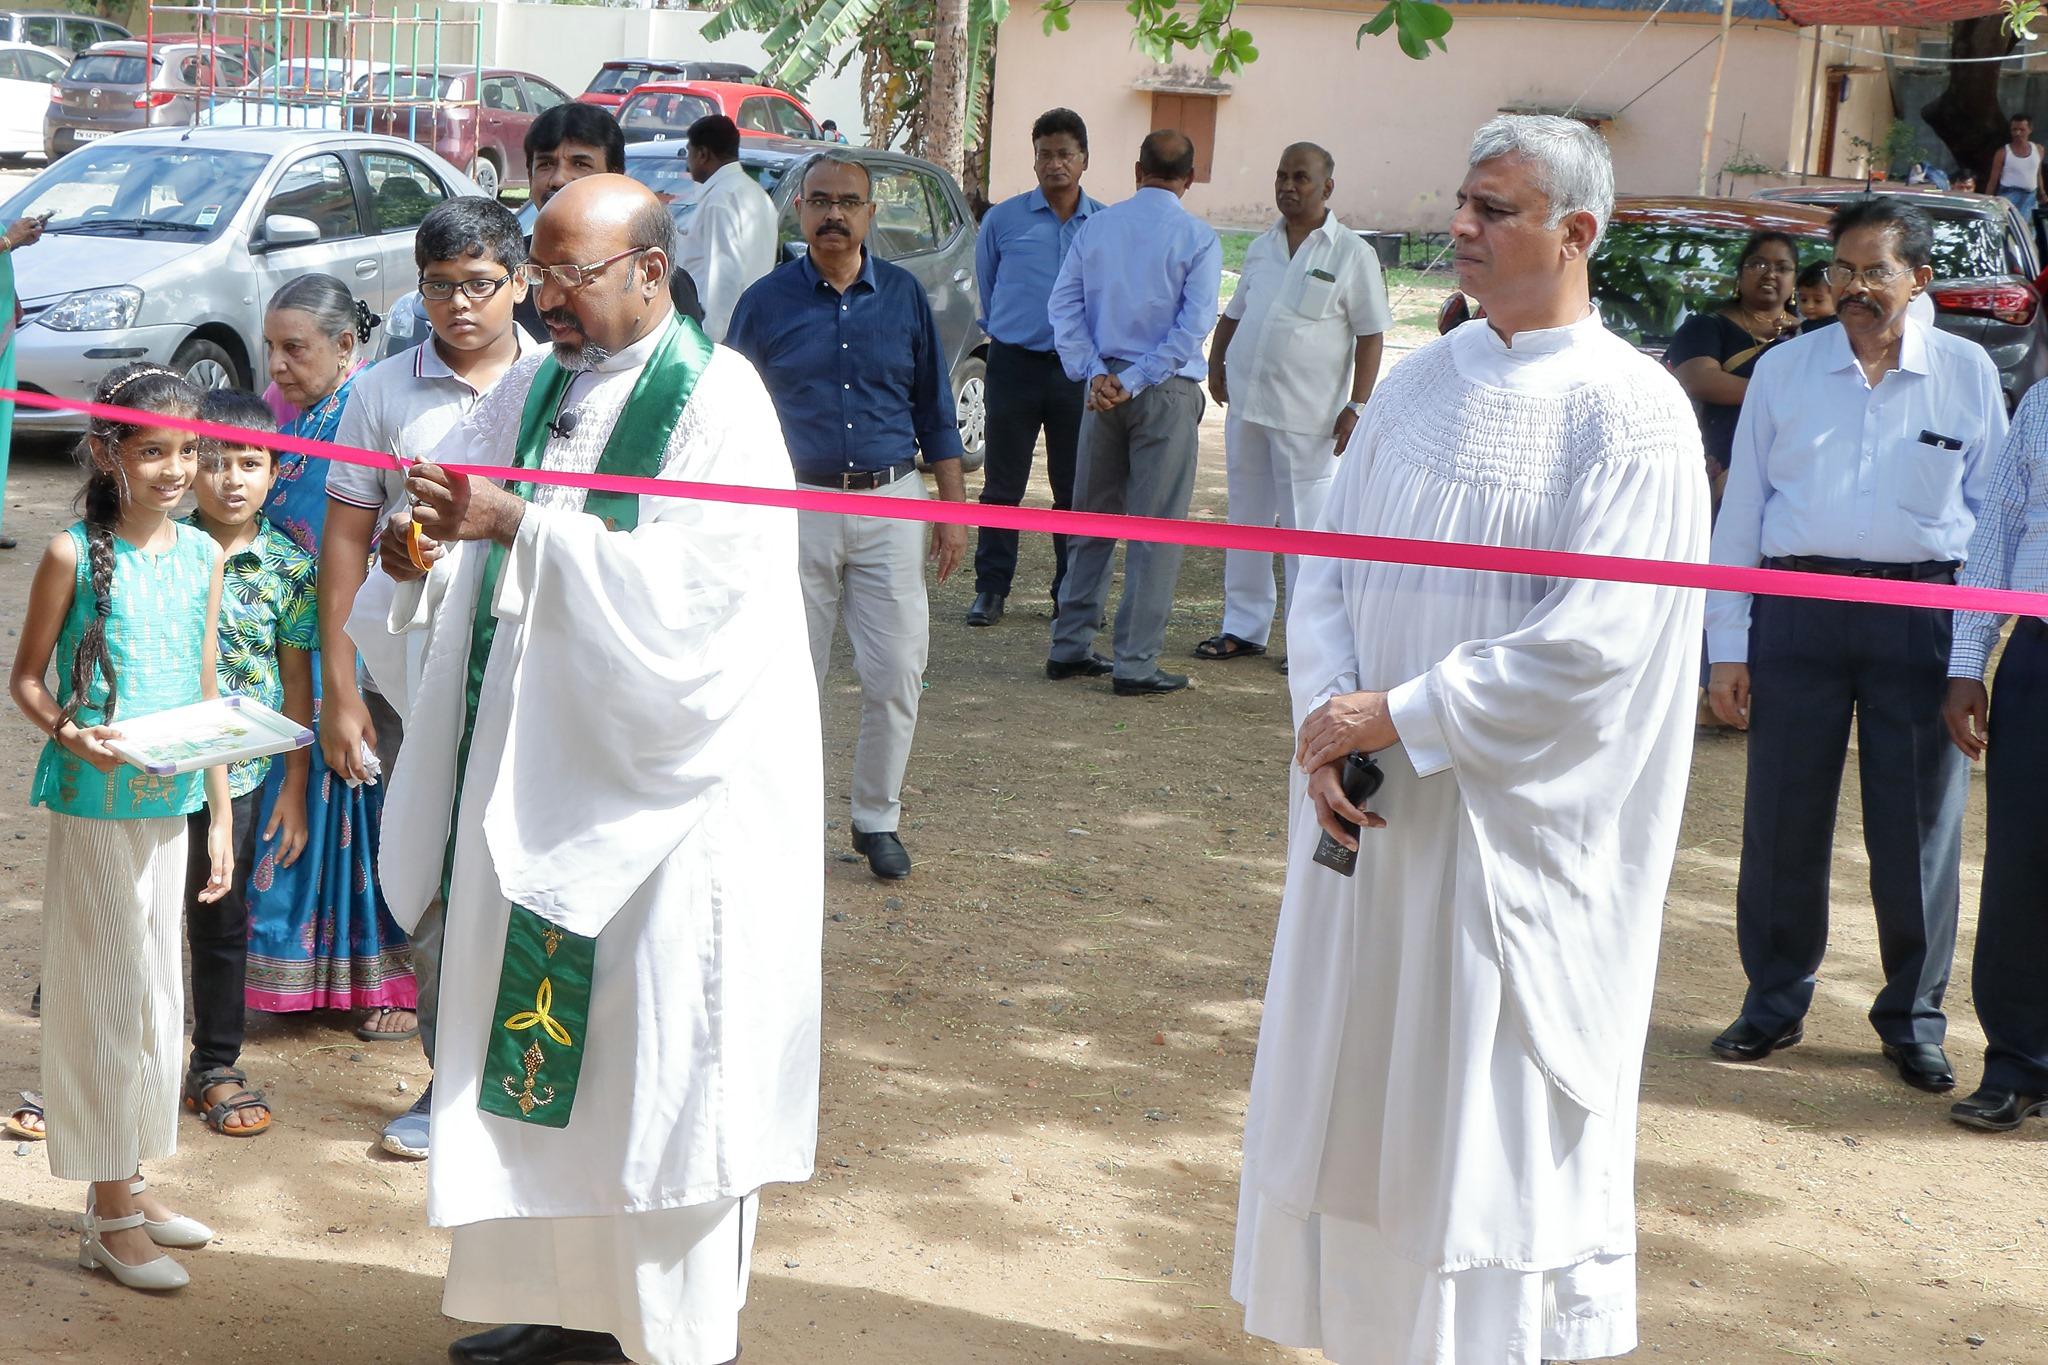 Mission Festival Inauguration